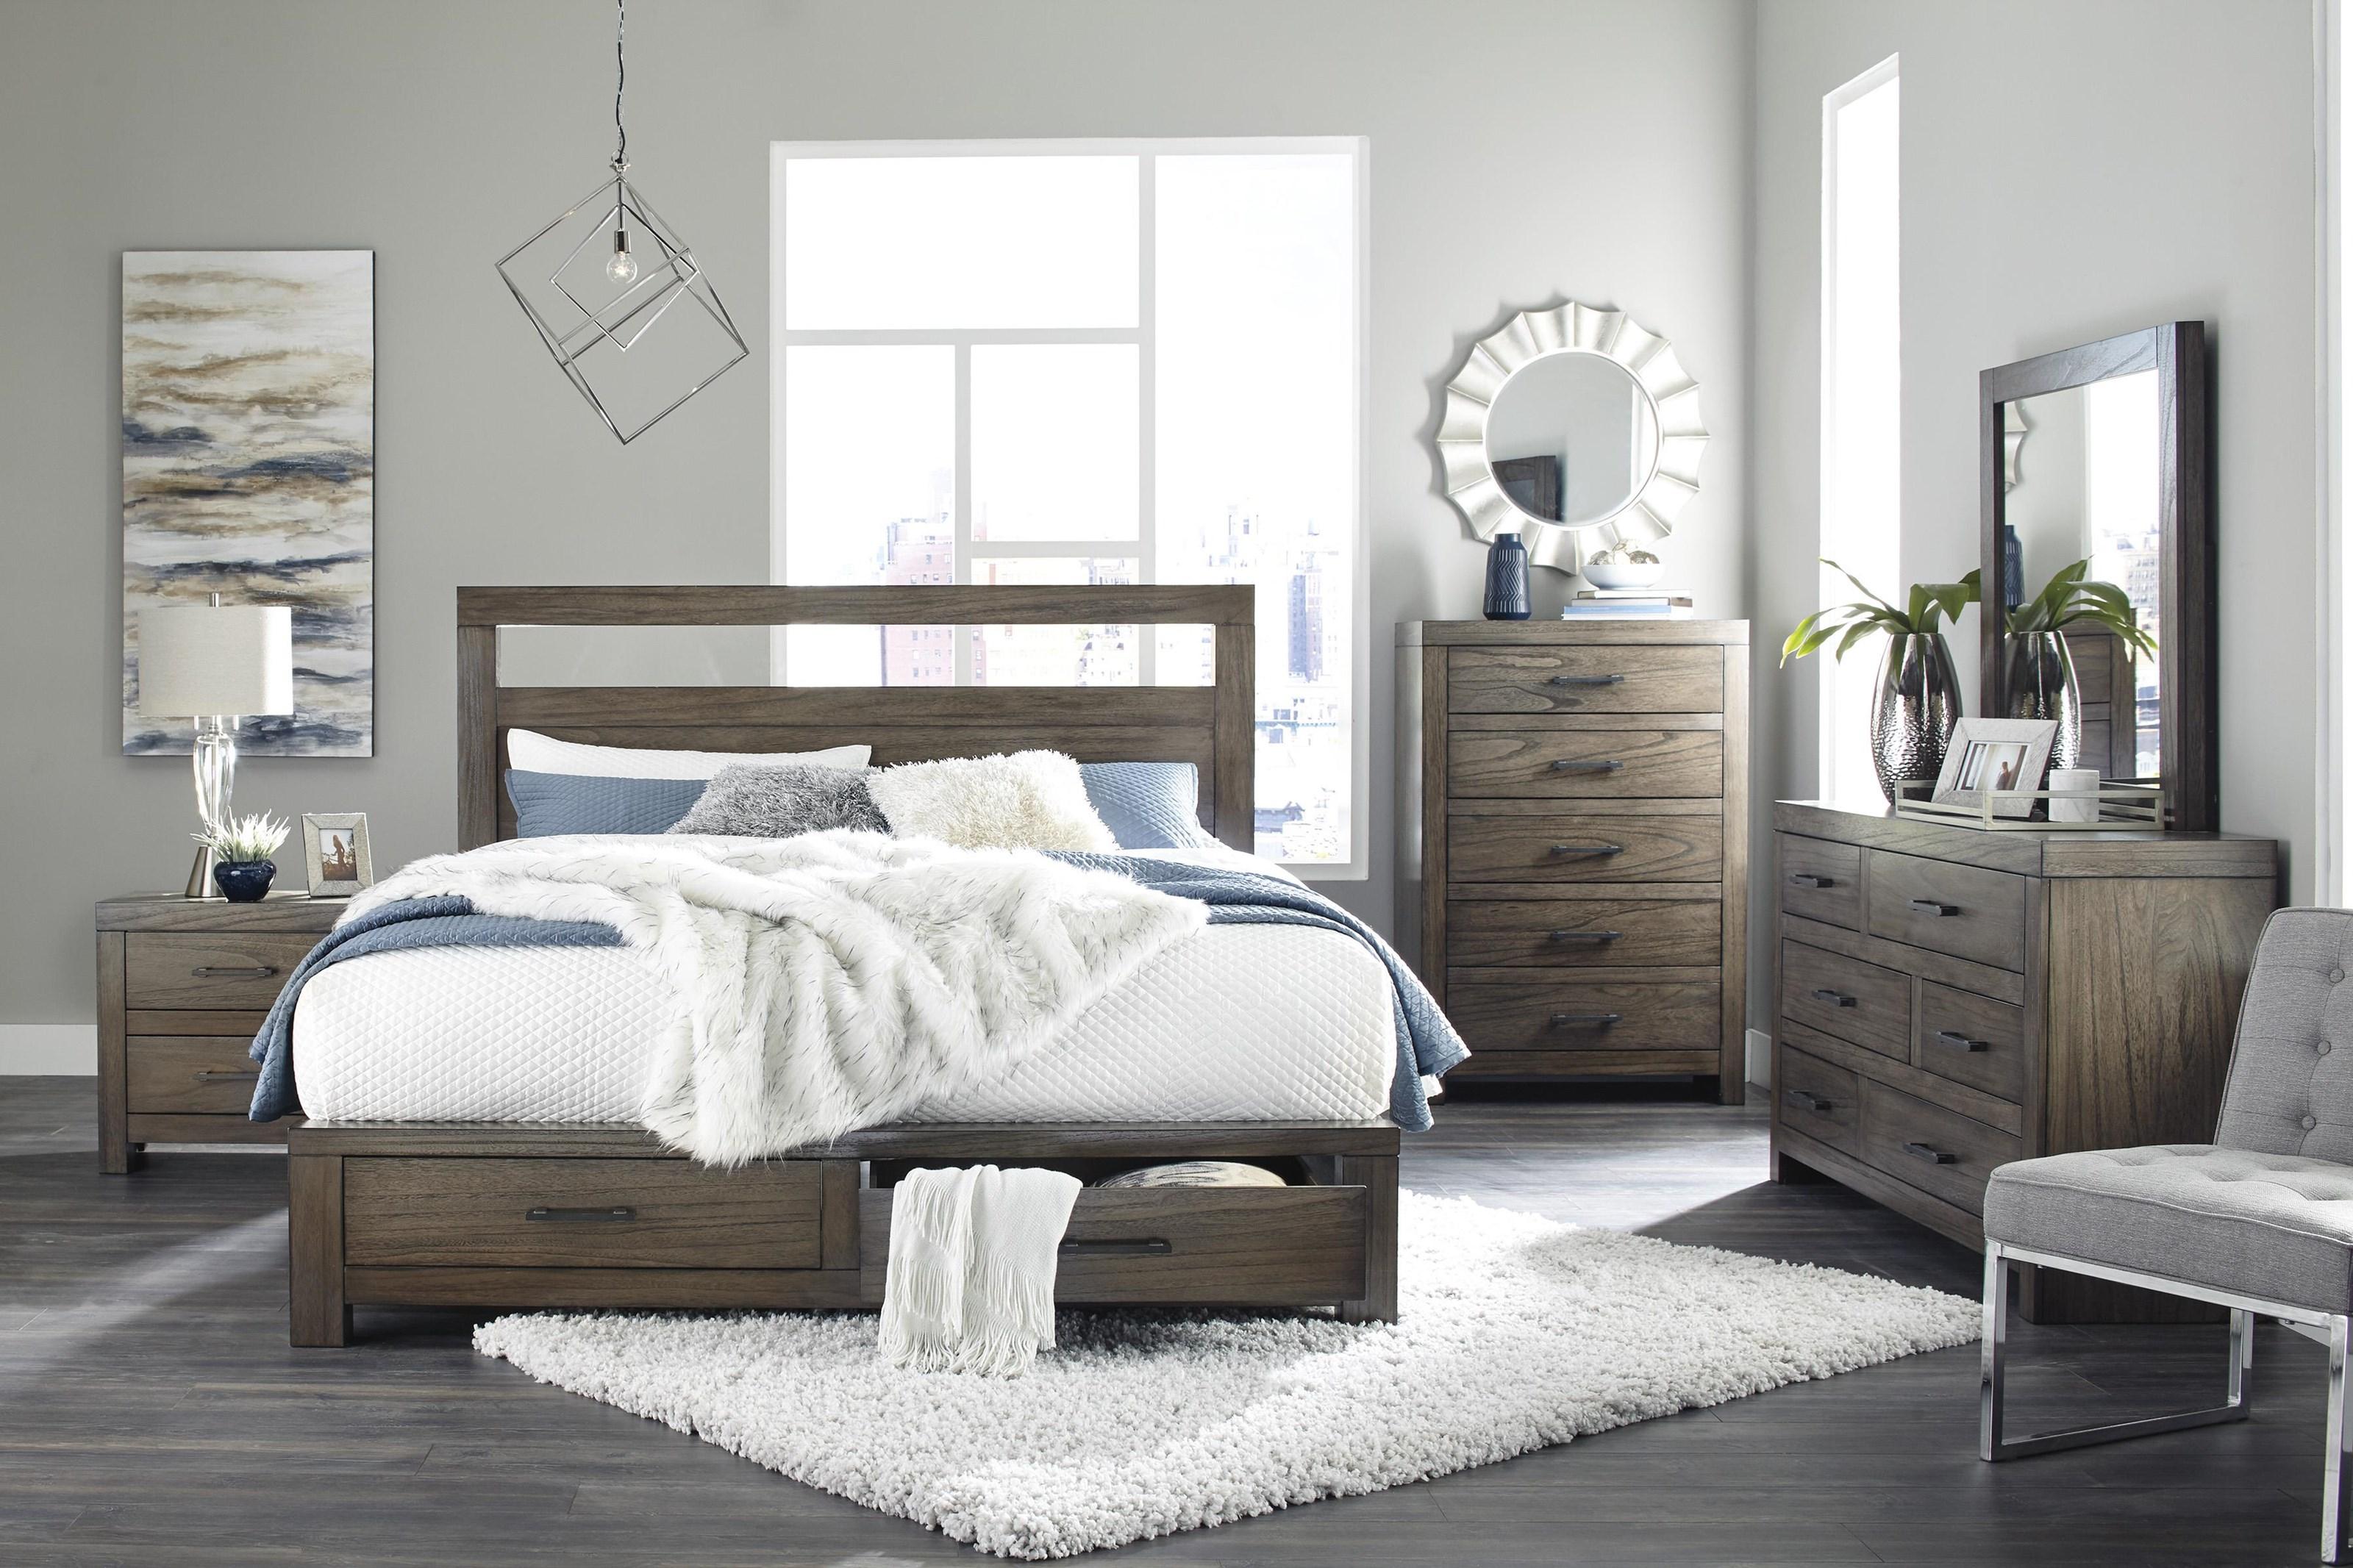 Ashley Furniture Deylin B537 57 54s 31 36 92 Queen Platform Bed With Storage Footboard Dresser Mirror And Nightstand Package Sam Levitz Furniture Bedroom Groups